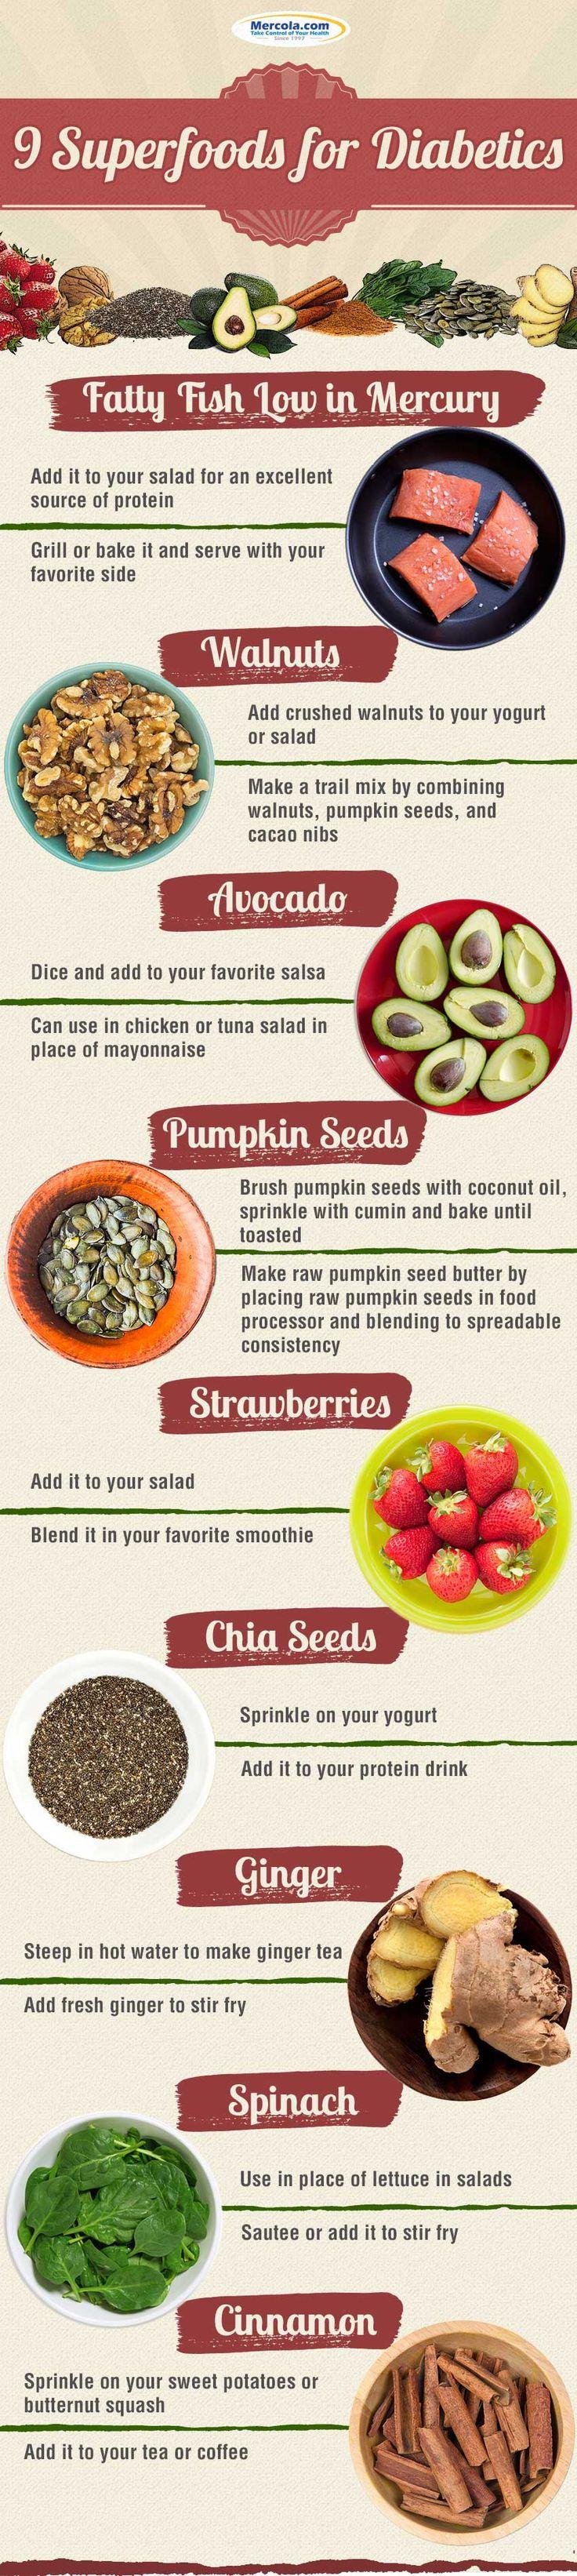 9 Superfoods for Diabetics